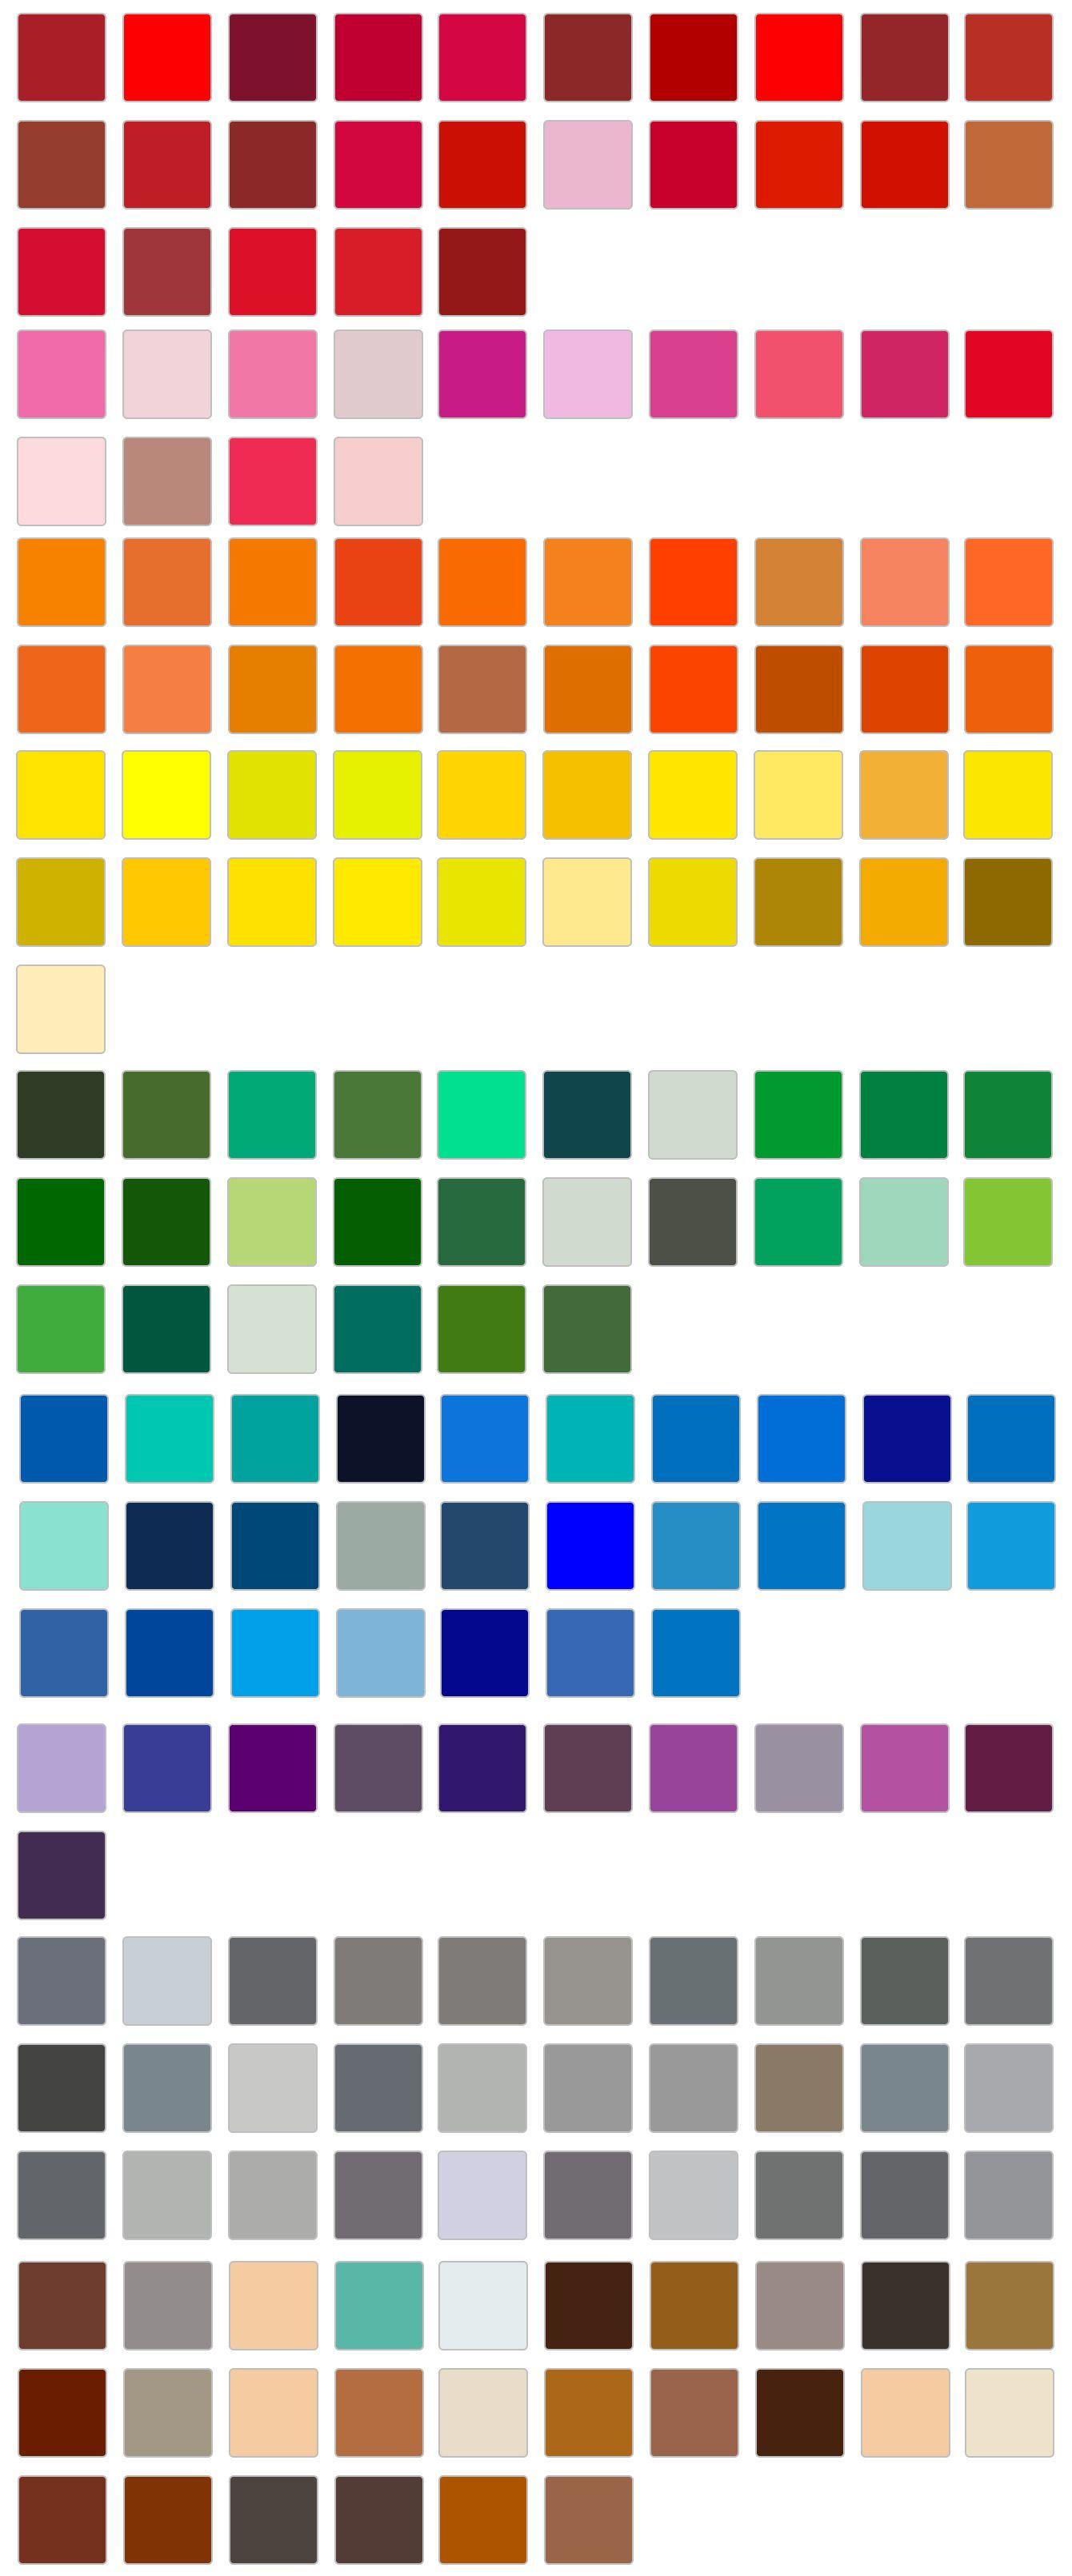 Available Krylon Spray Paint Colors Krylon Spray Paint Colors Spray Paint Colors Krylon Spray Paint